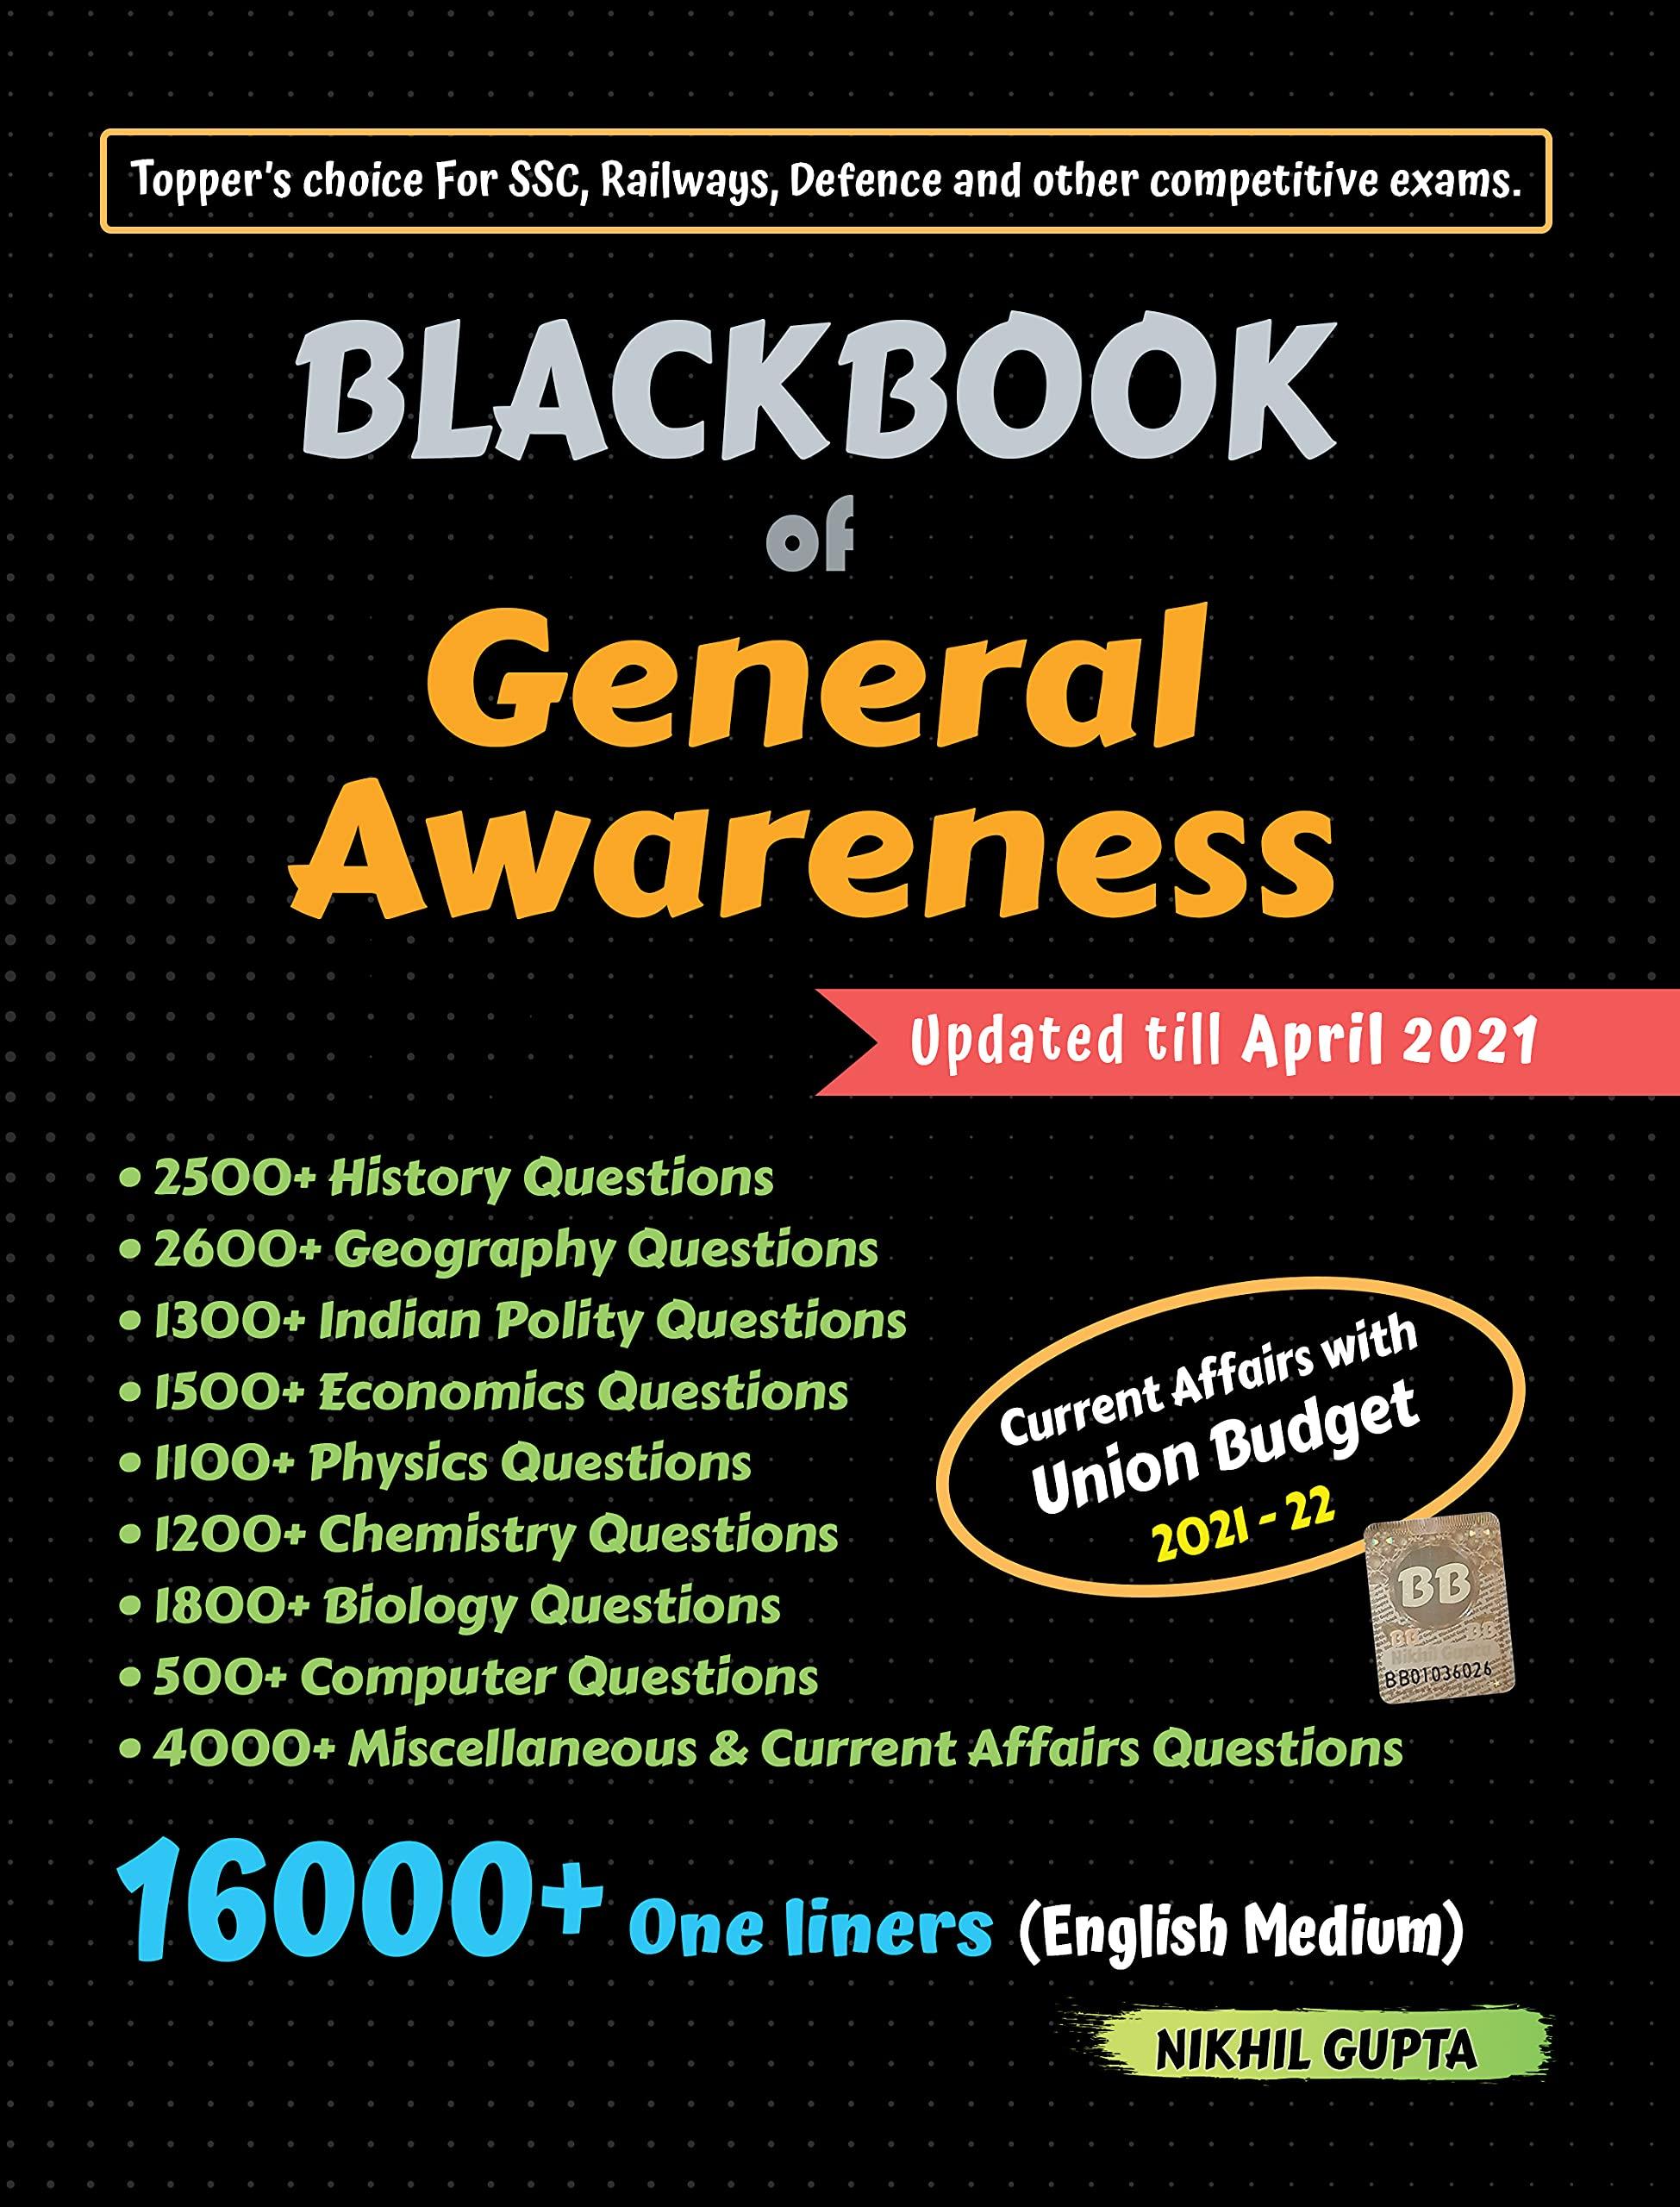 BlackBook of General Awareness April 2021 by Nikhil Gupta